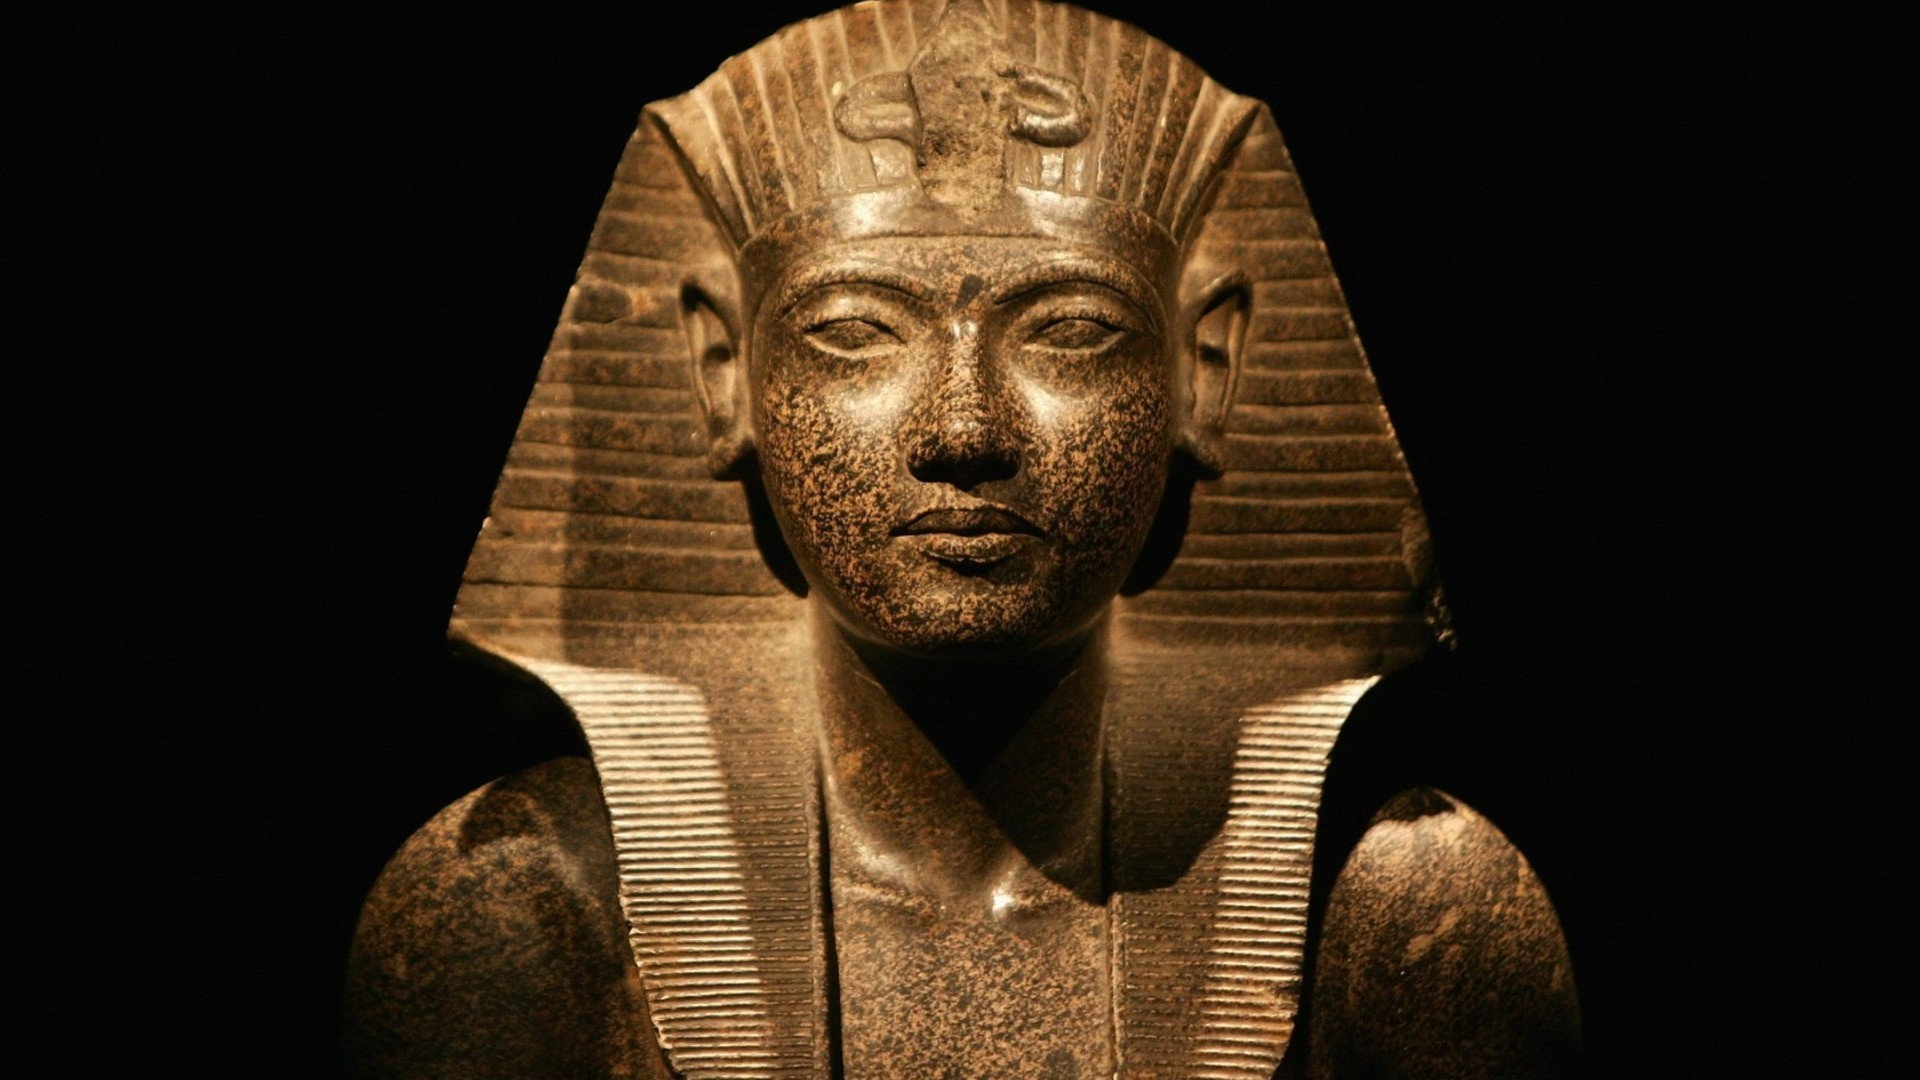 sculpture statue Egypt Pharaoh wallpaper